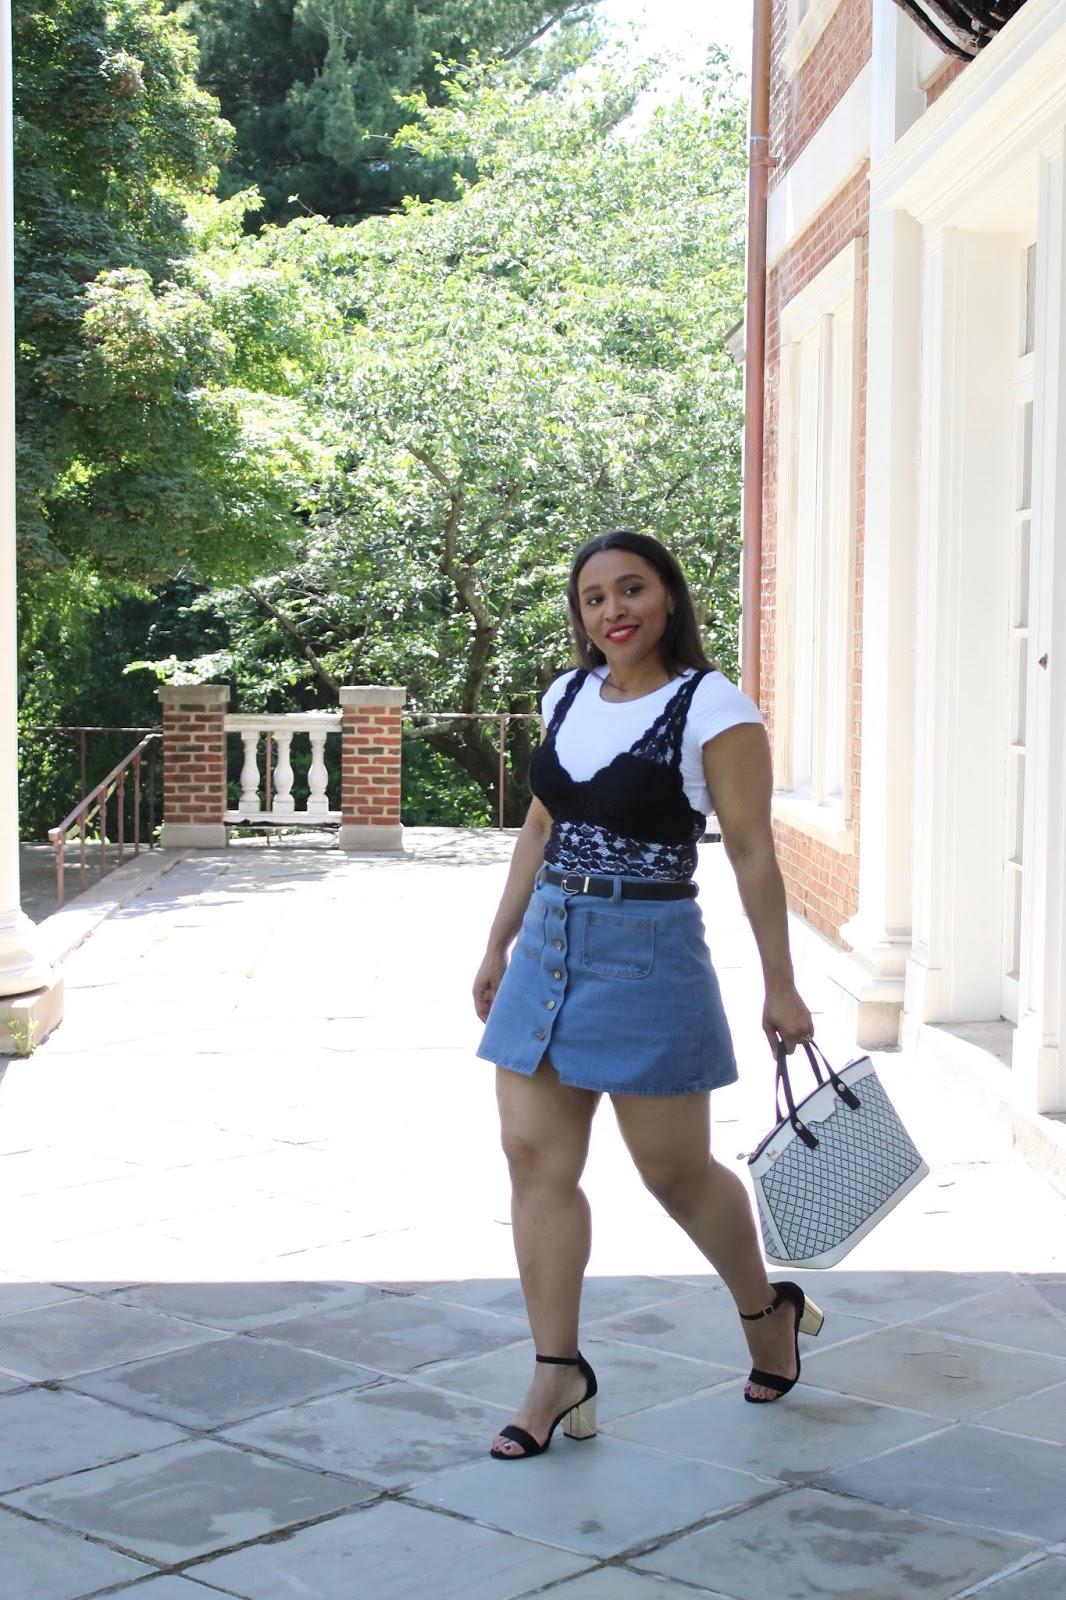 Lace Bralette Over White T-Shirt, bralette trend, bra over shirt, henri bendal bags, summer looks, fashion blogger outfits, mirrored sunglasses